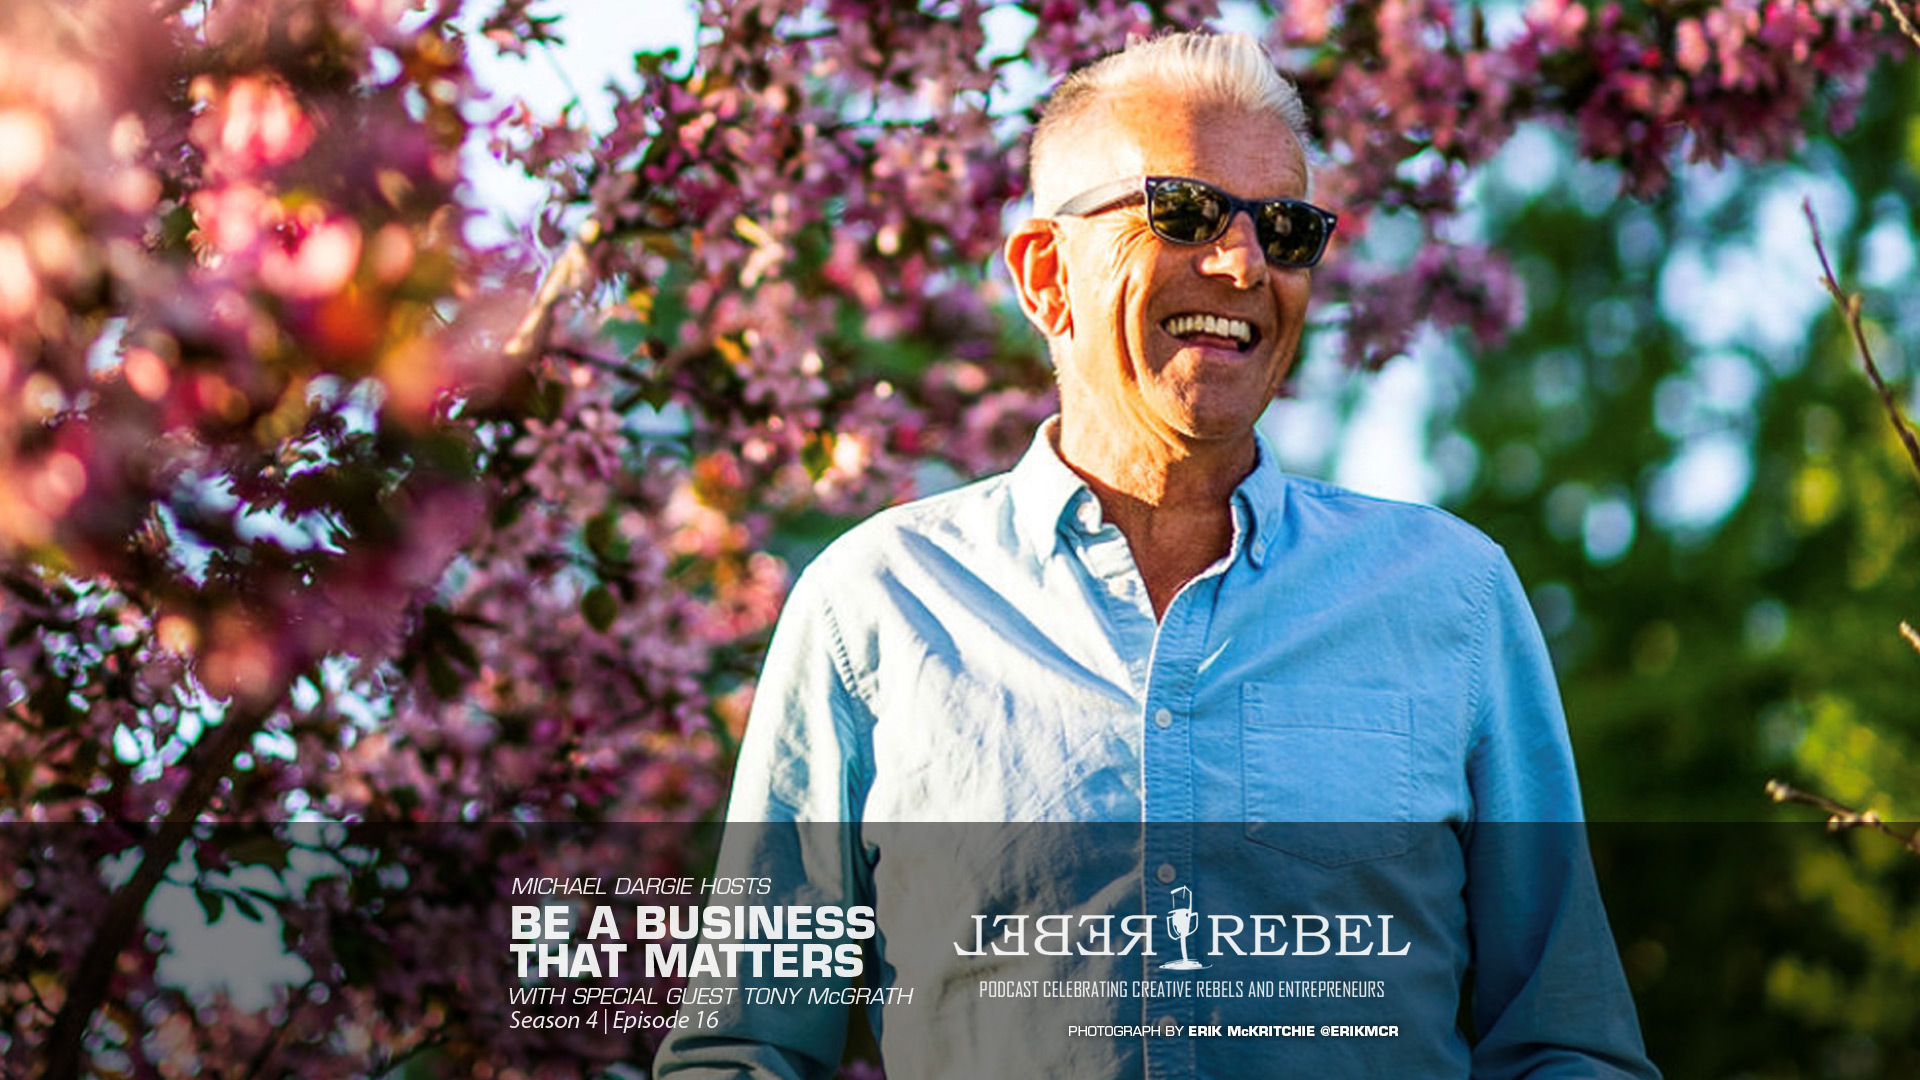 Tony McGrath on the RebelRebel Podcast